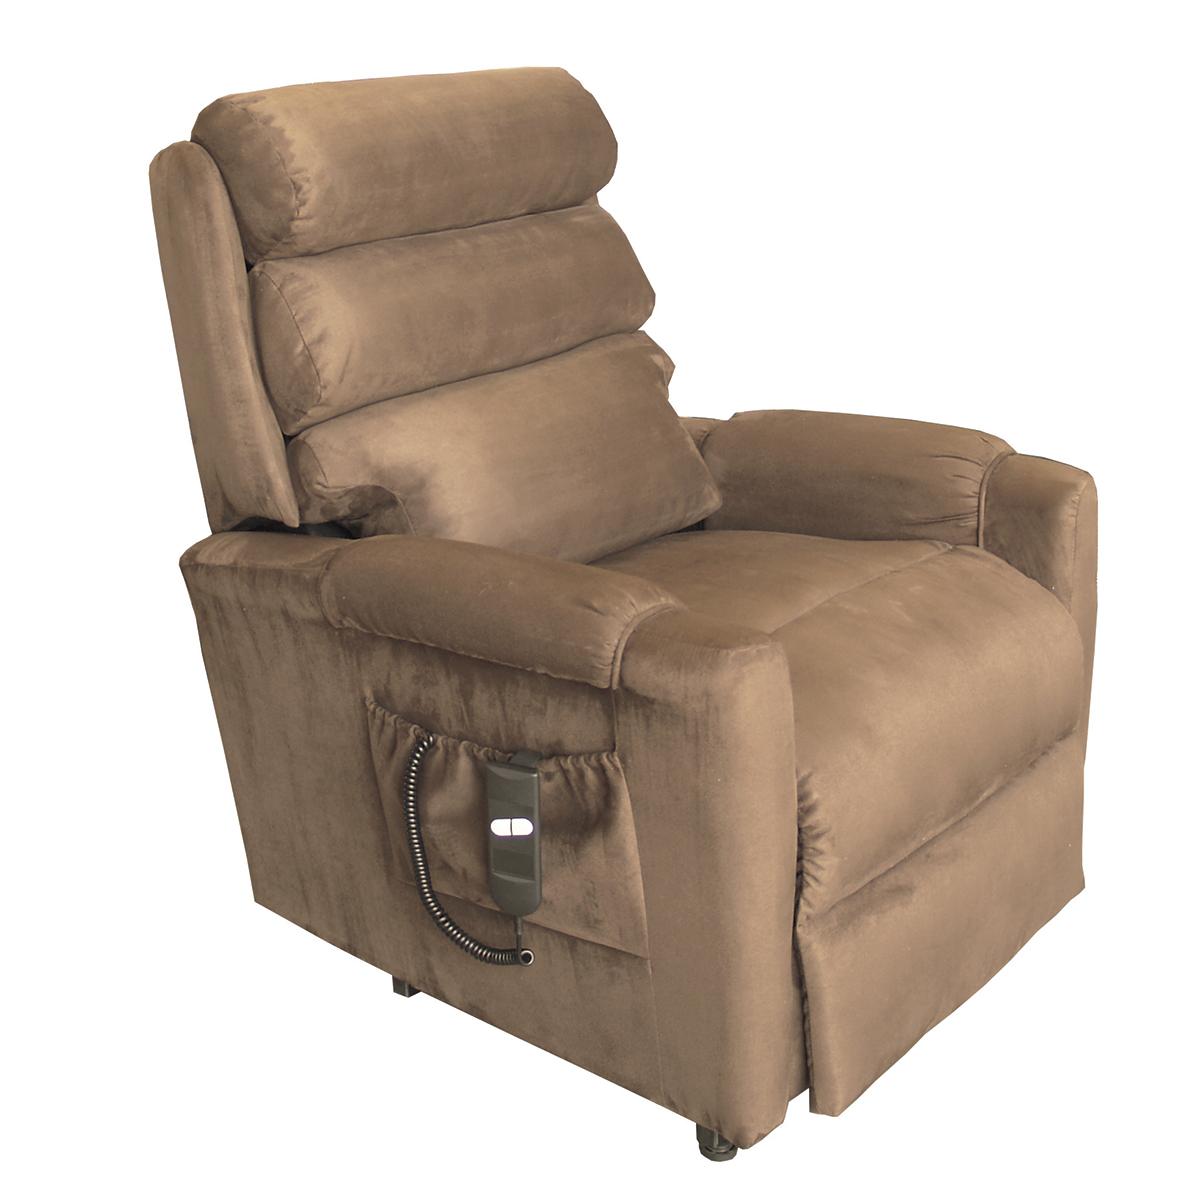 oxypharm fauteuil releveur stylea ii 2 moteurs. Black Bedroom Furniture Sets. Home Design Ideas